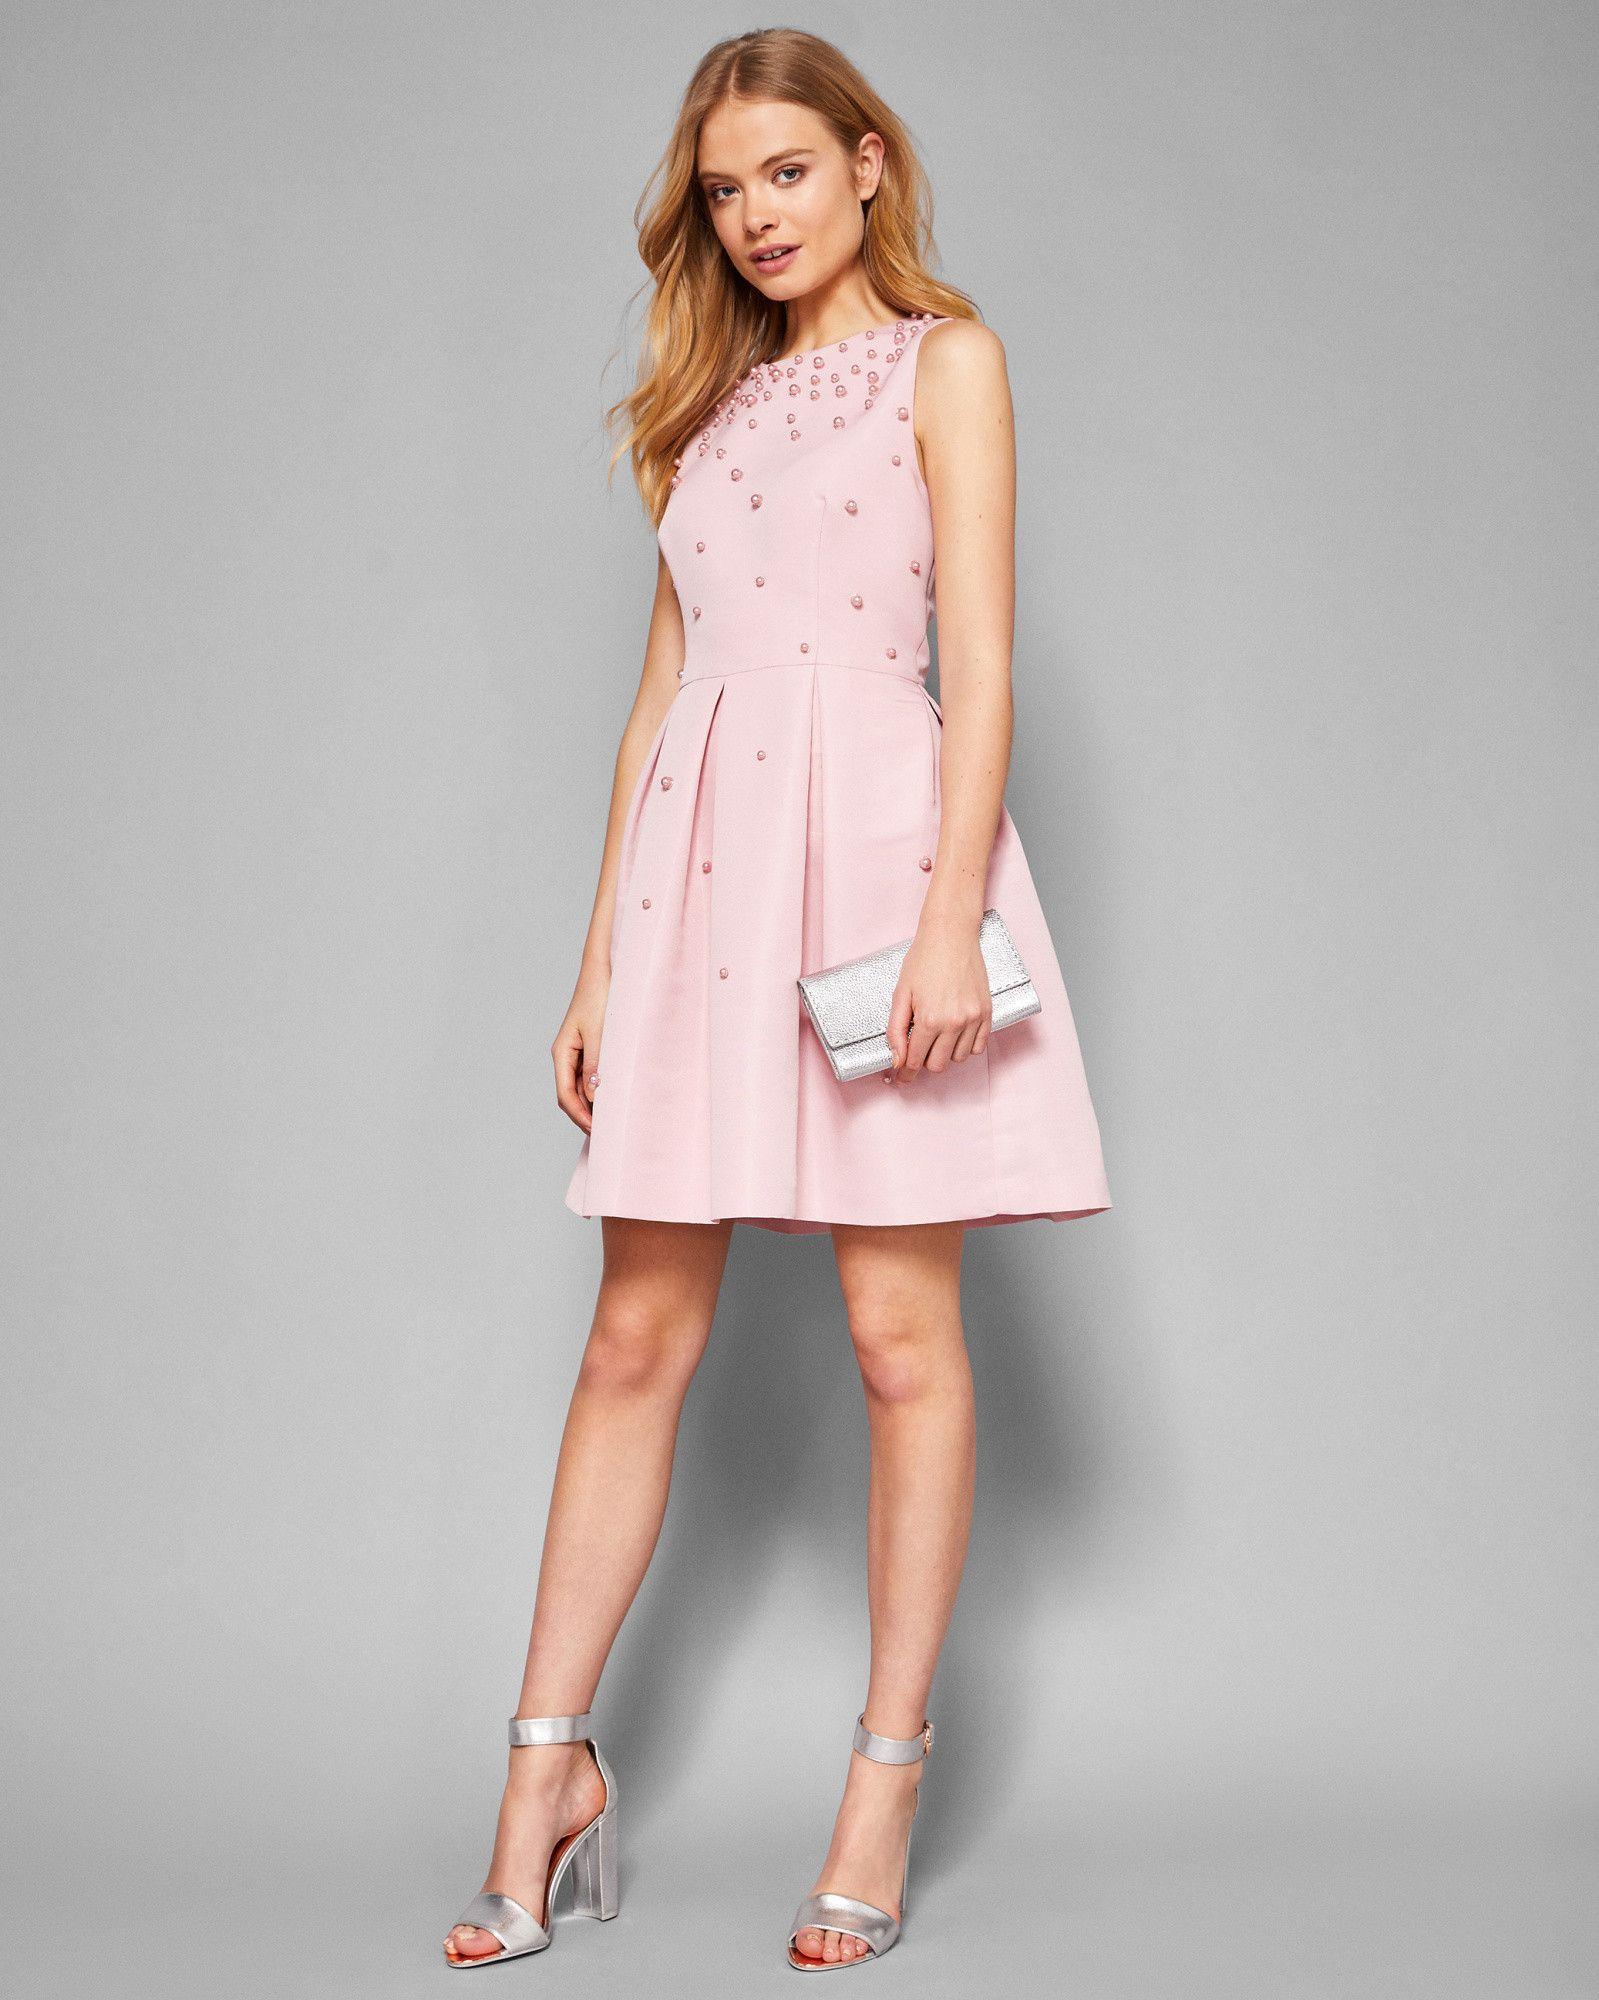 e725bea5 MILLIEA Pearl embellished skater dress #TedToToe | Elegance | Baby ...